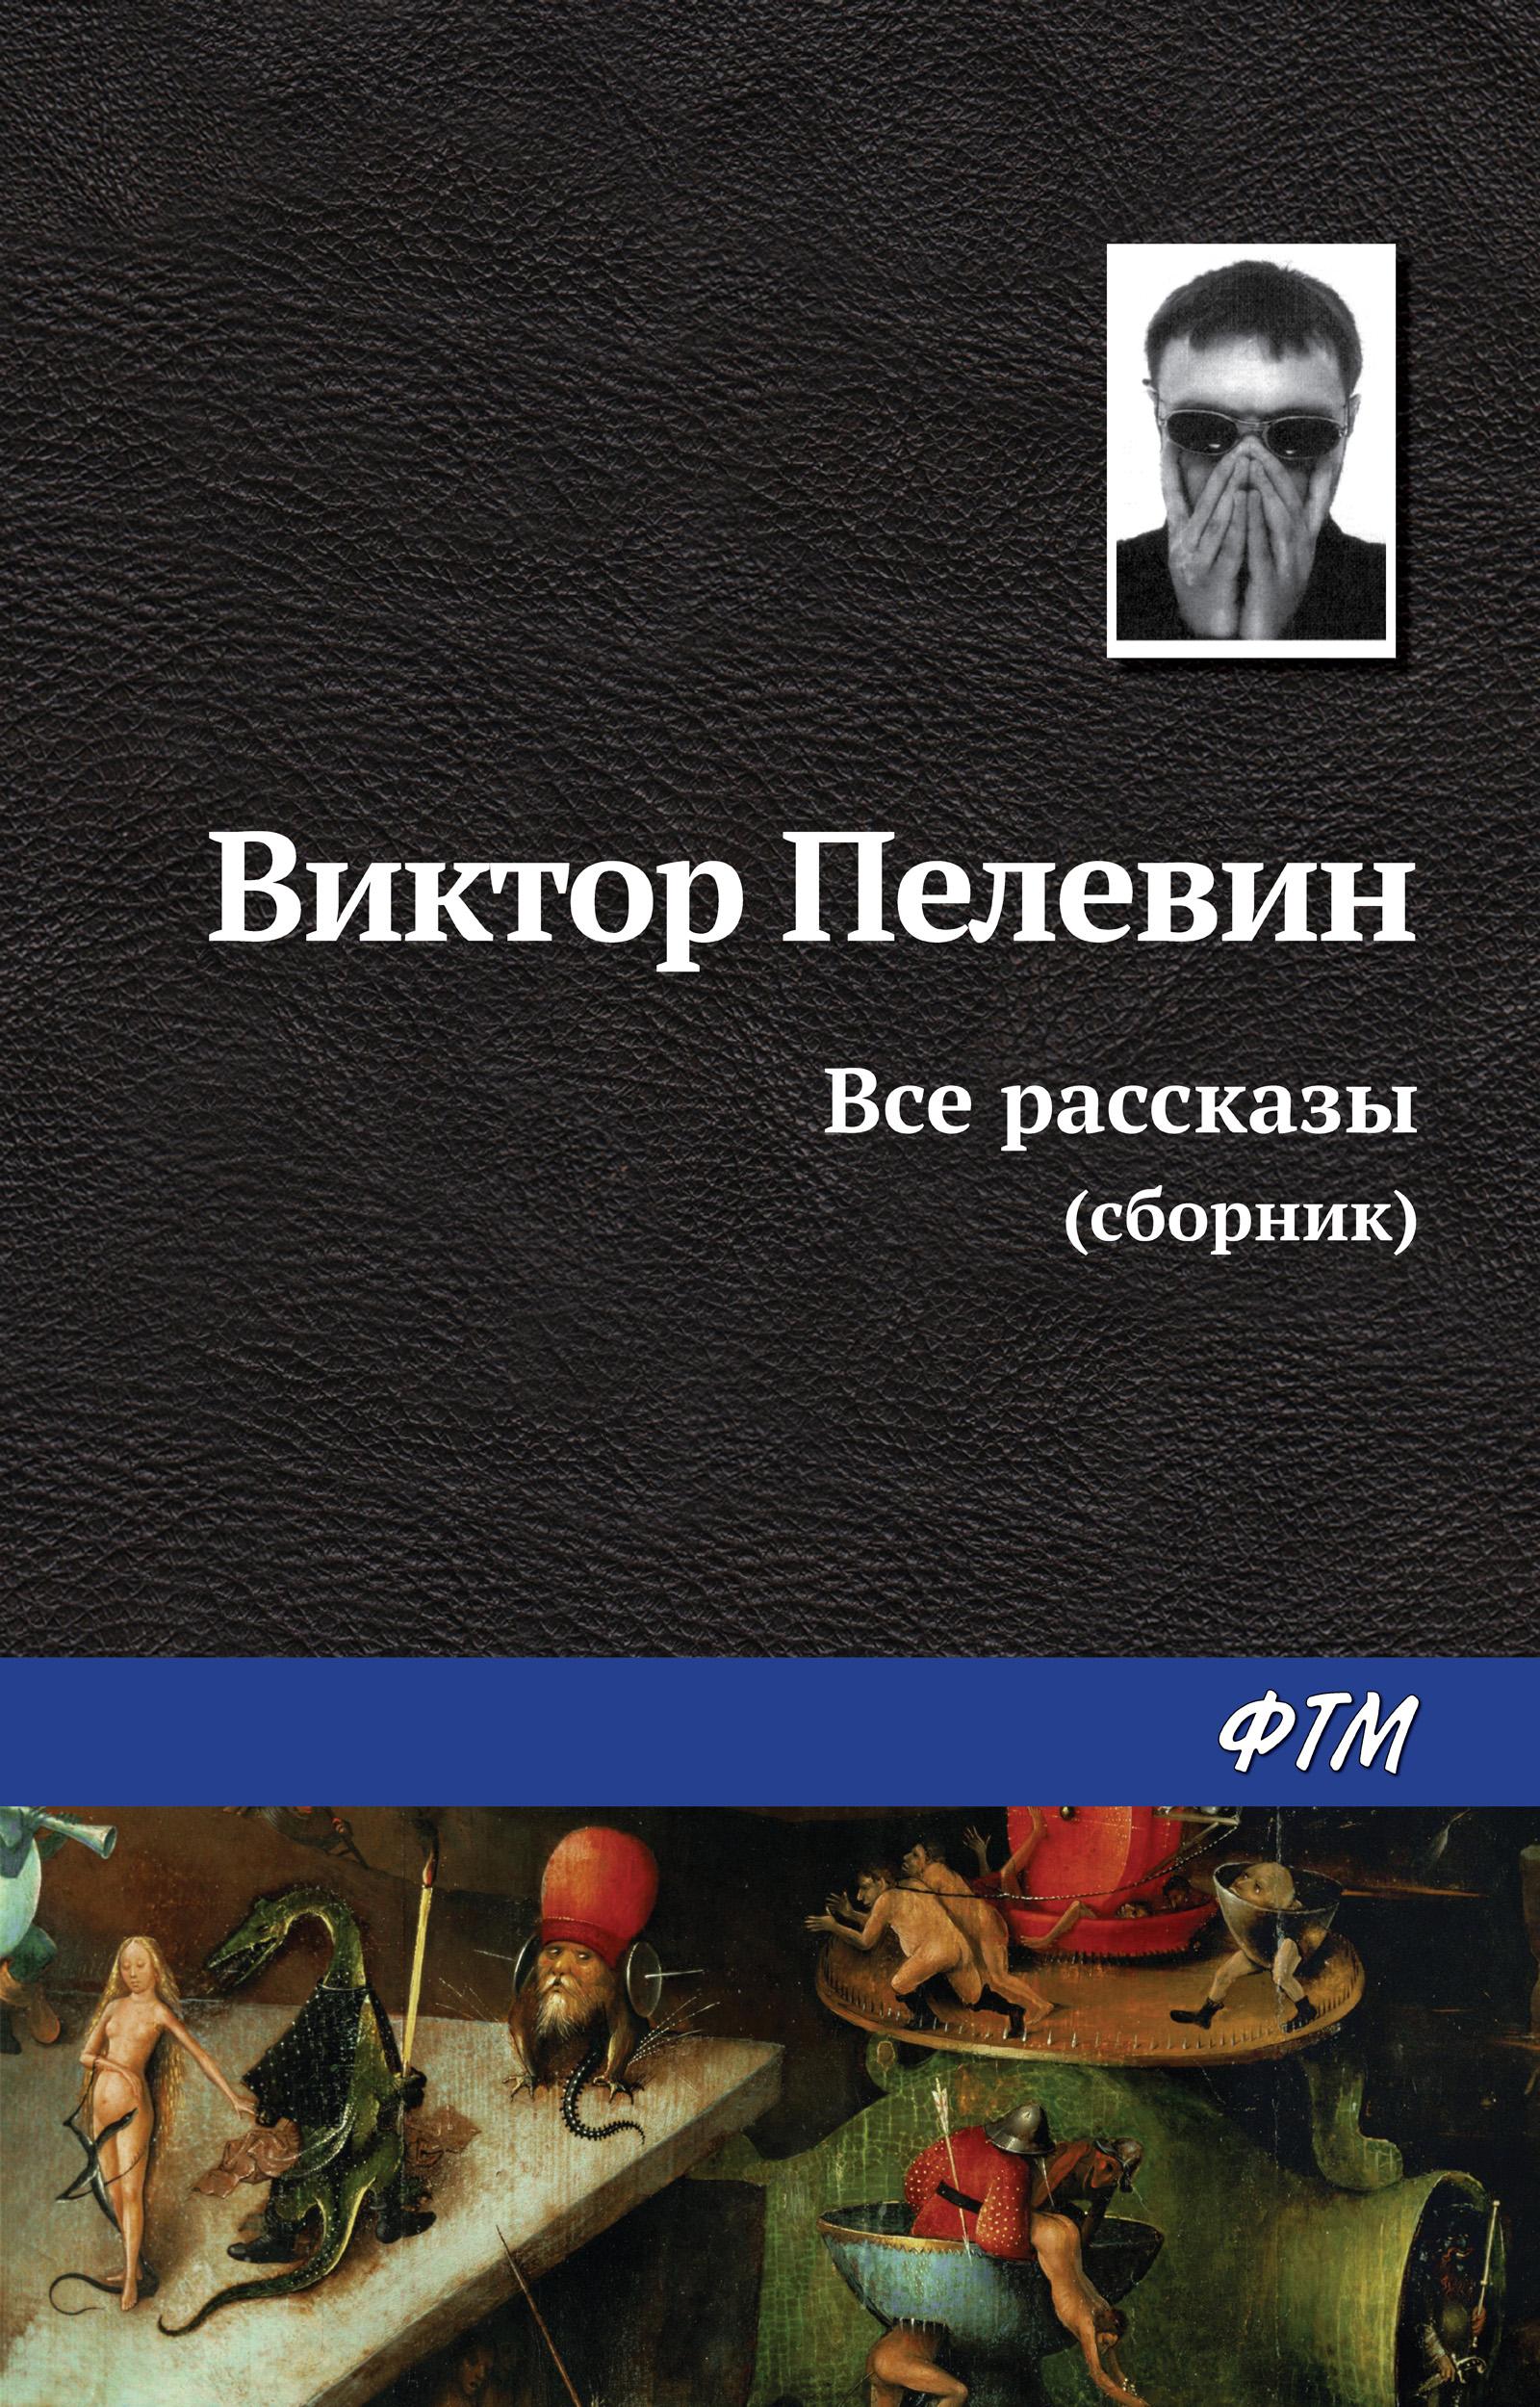 Виктор Пелевин Все рассказы (сборник) виктор пелевин гость на празднике бон isbn 978 5 4467 0284 8